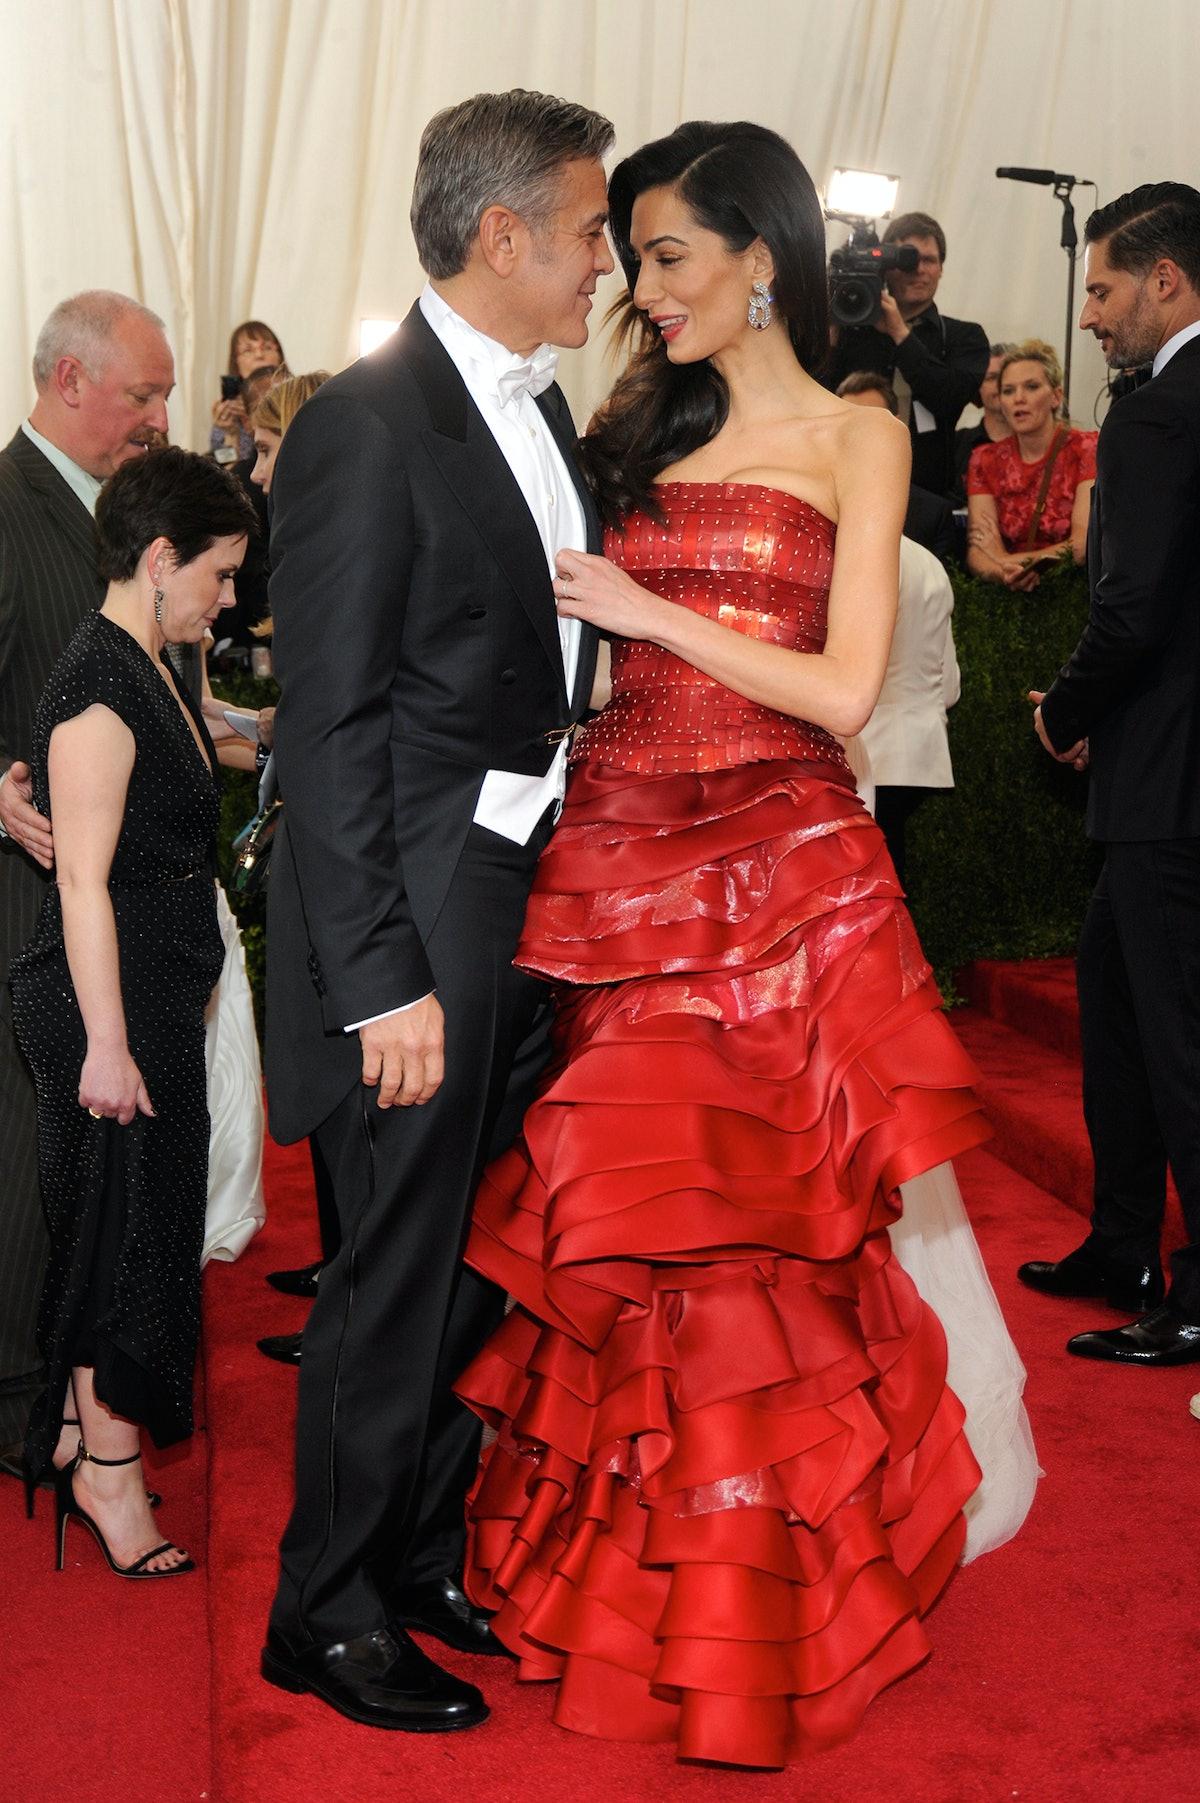 George Clooney in Georgio Armani and Amal Clooney in Margiela